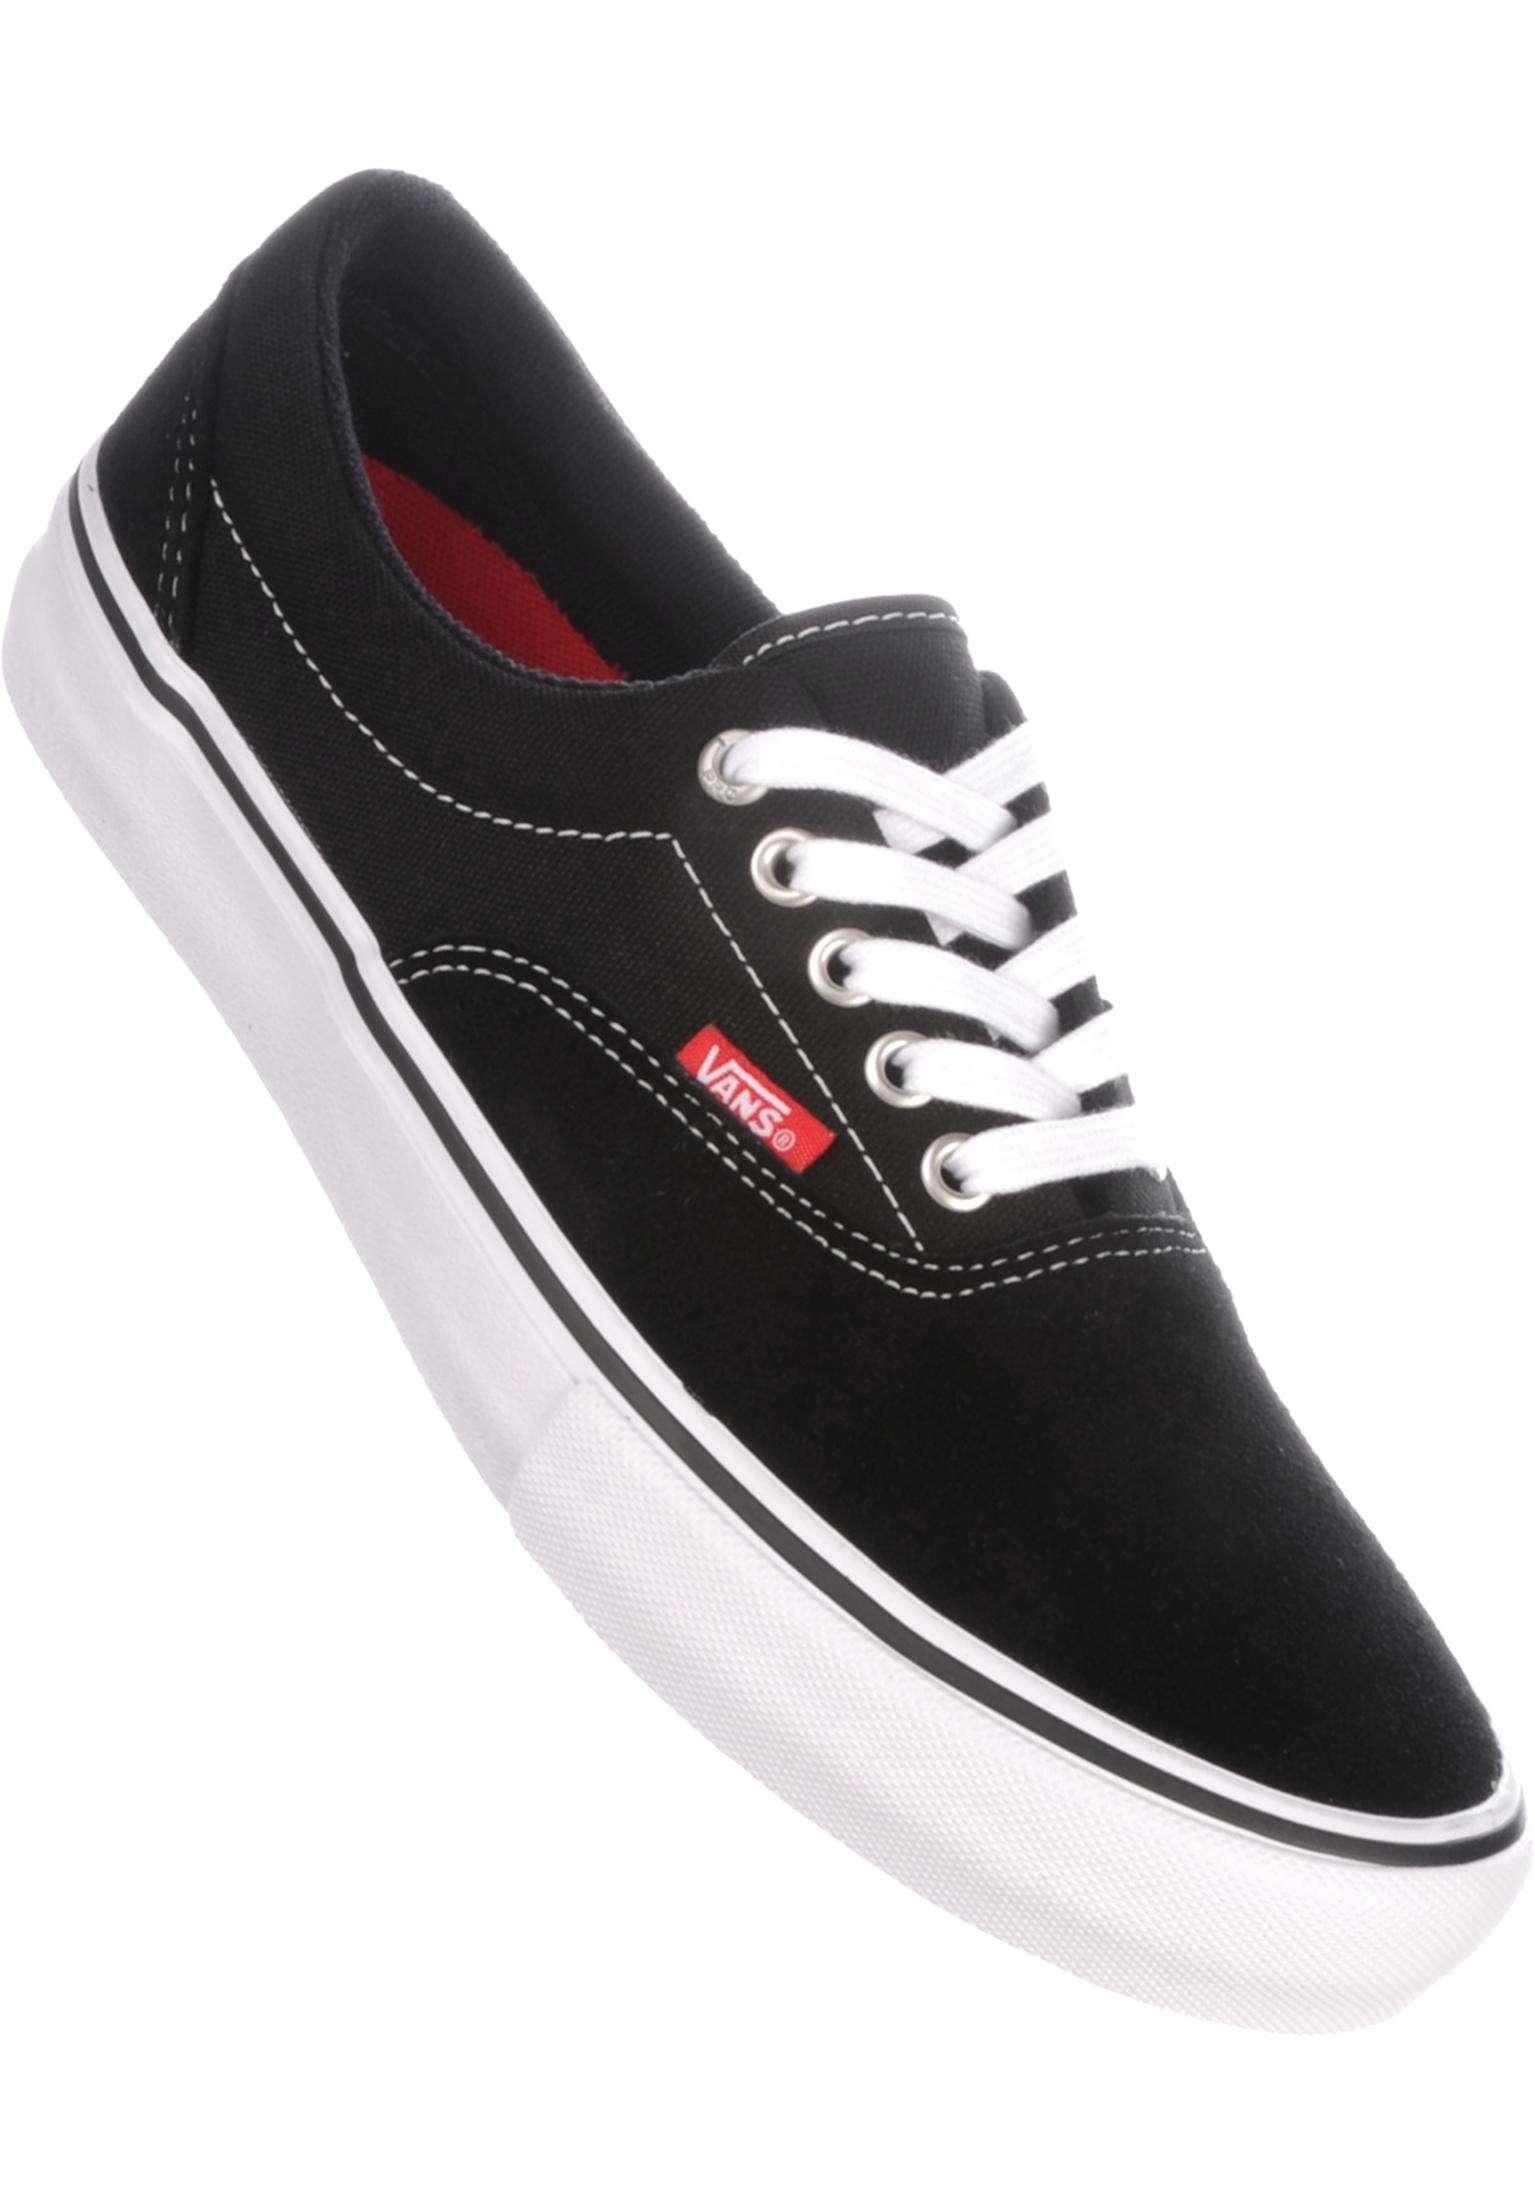 cf2aa94c9a Era Pro Vans All Shoes in black-white-gum for Men